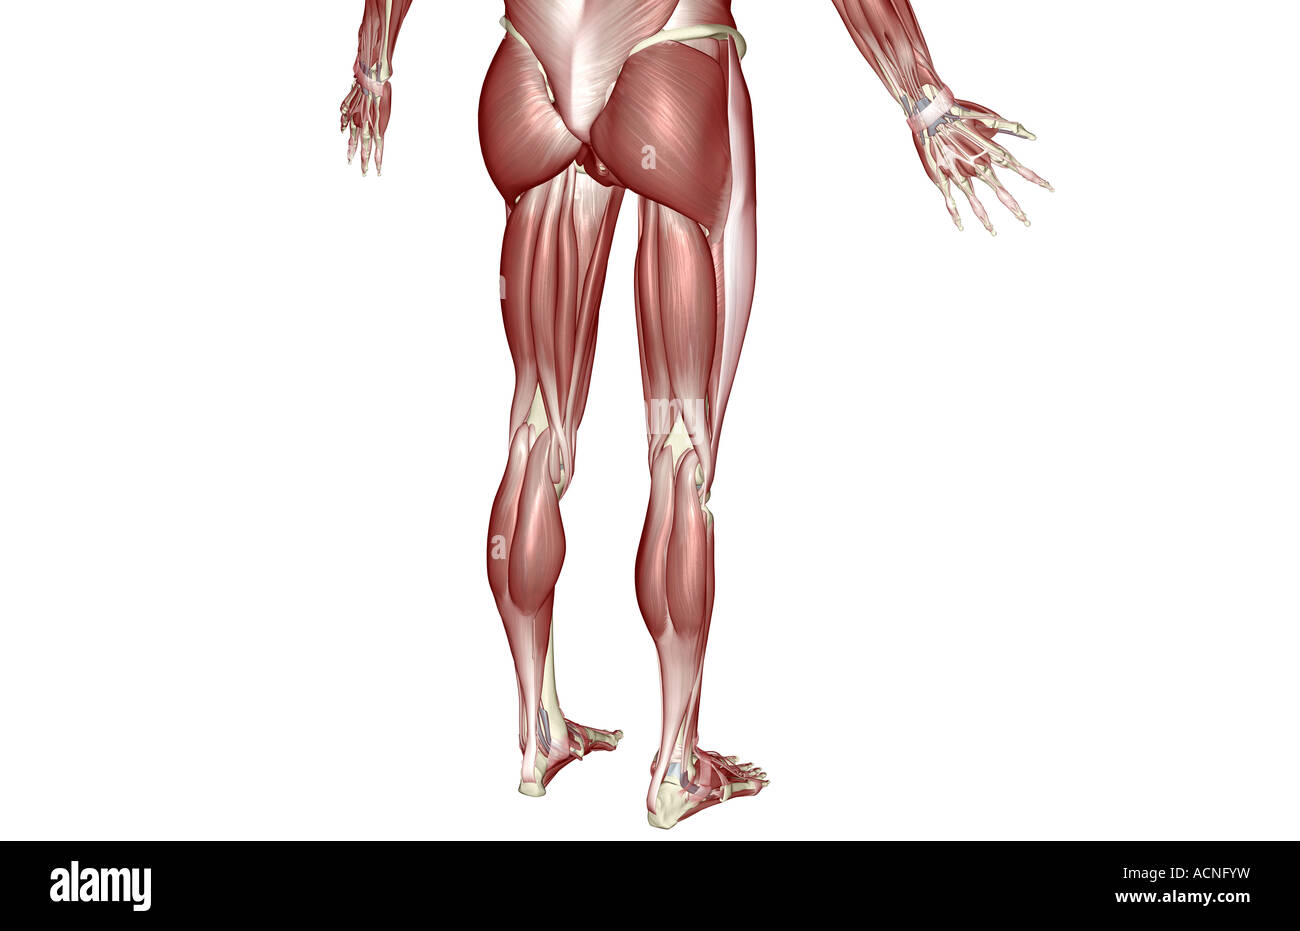 Lower Back Muscles Stockfotos & Lower Back Muscles Bilder - Alamy